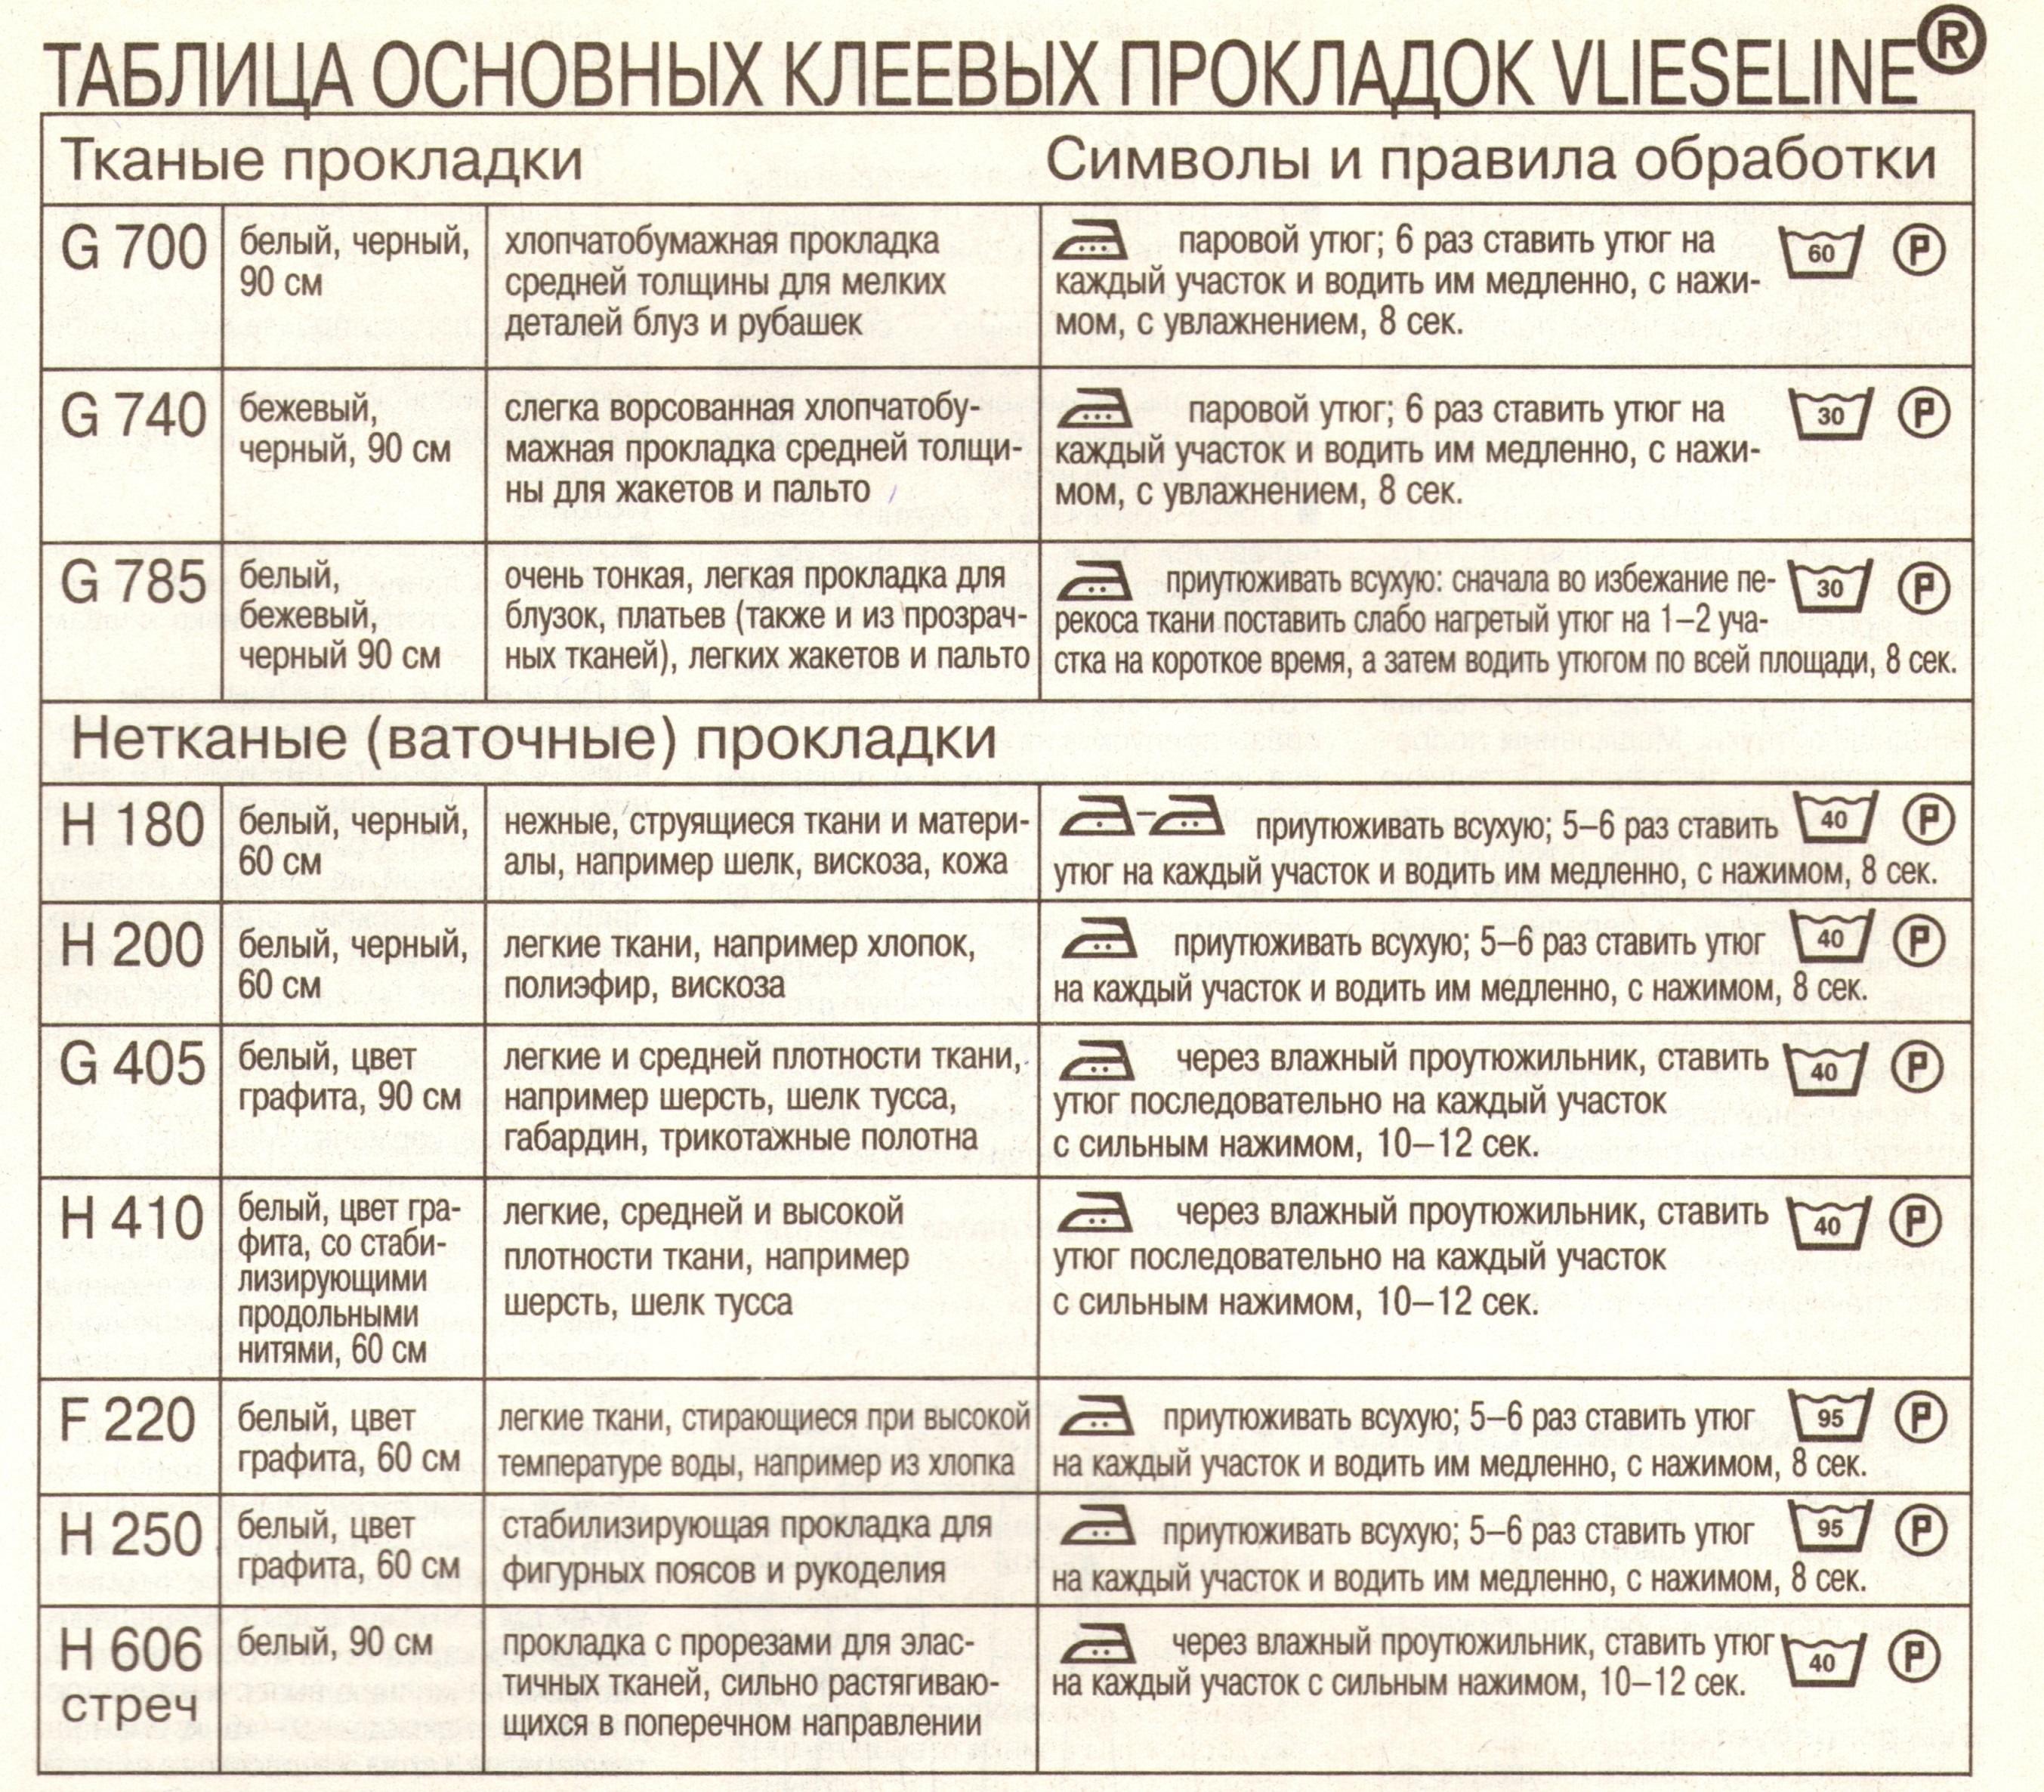 Таблица клеевых прокладок